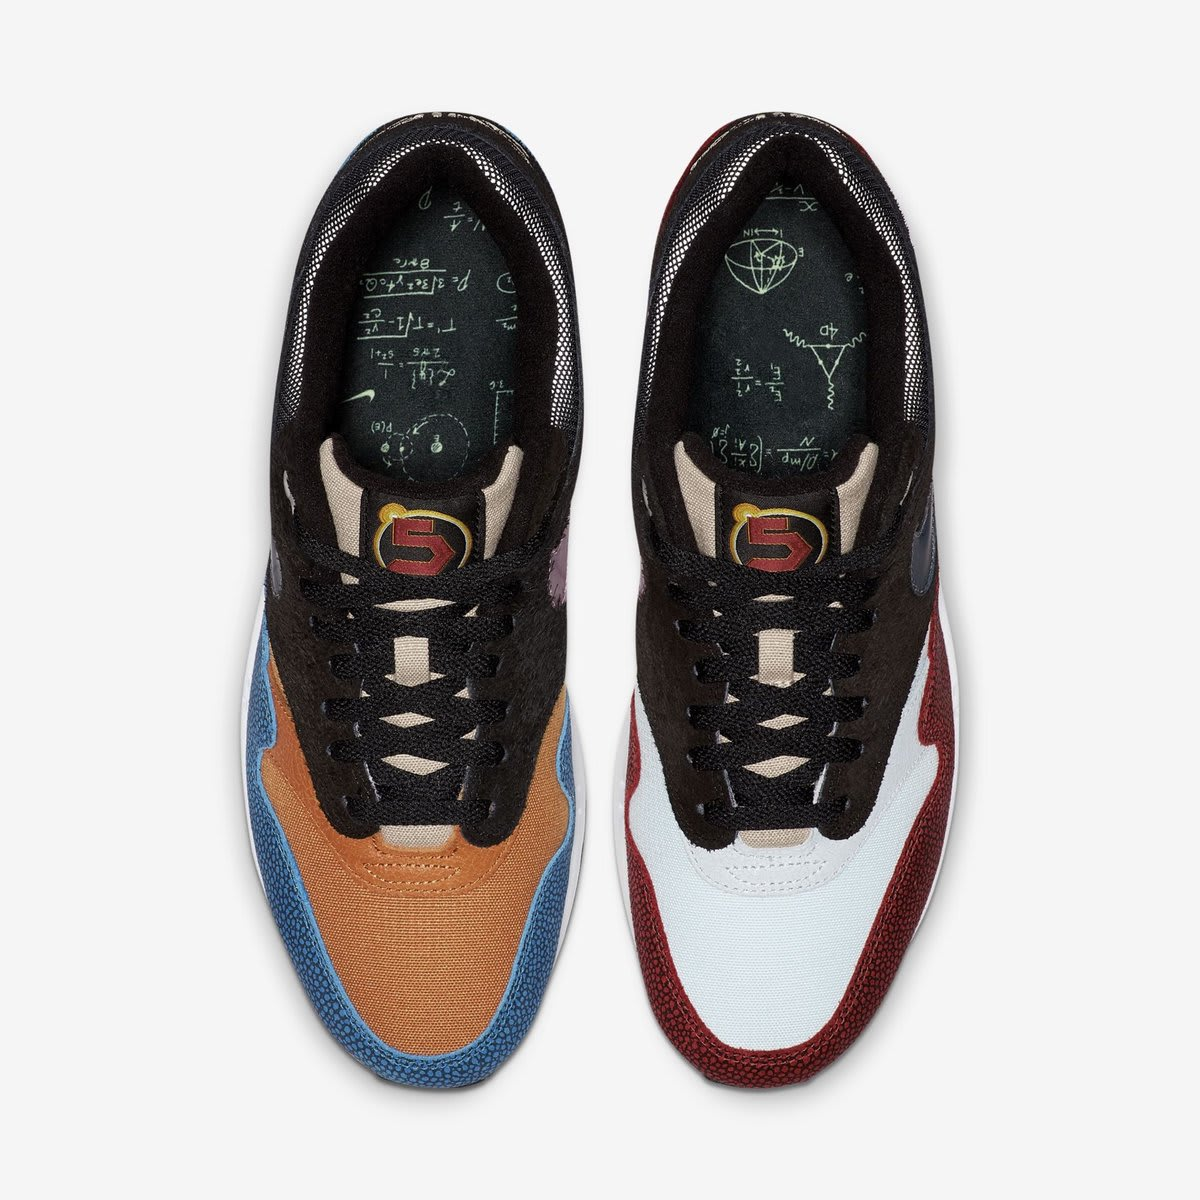 hot sale online a7a4c cb936 Image via  J23app · De Aaron Fox x Nike Air Max 1  Swipa  (Top)